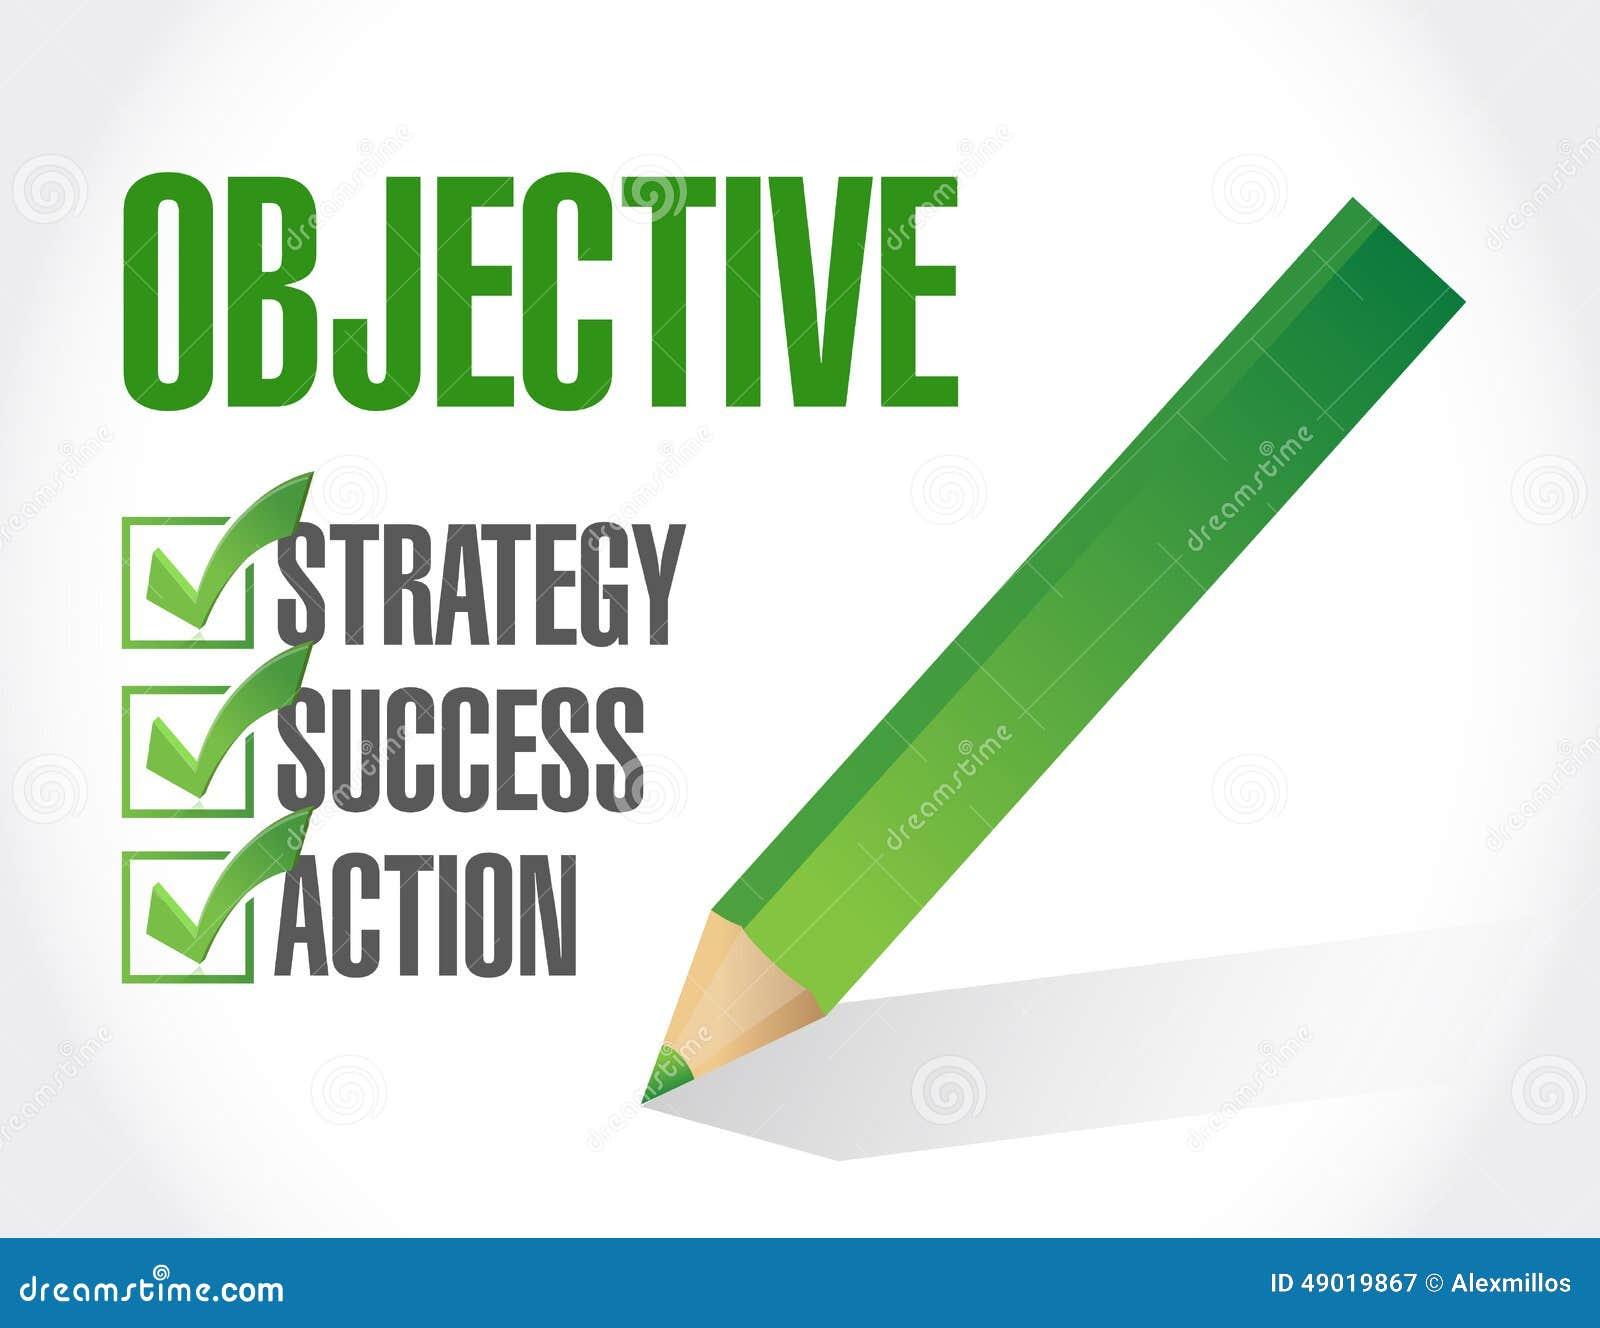 objective check list illustration design stock